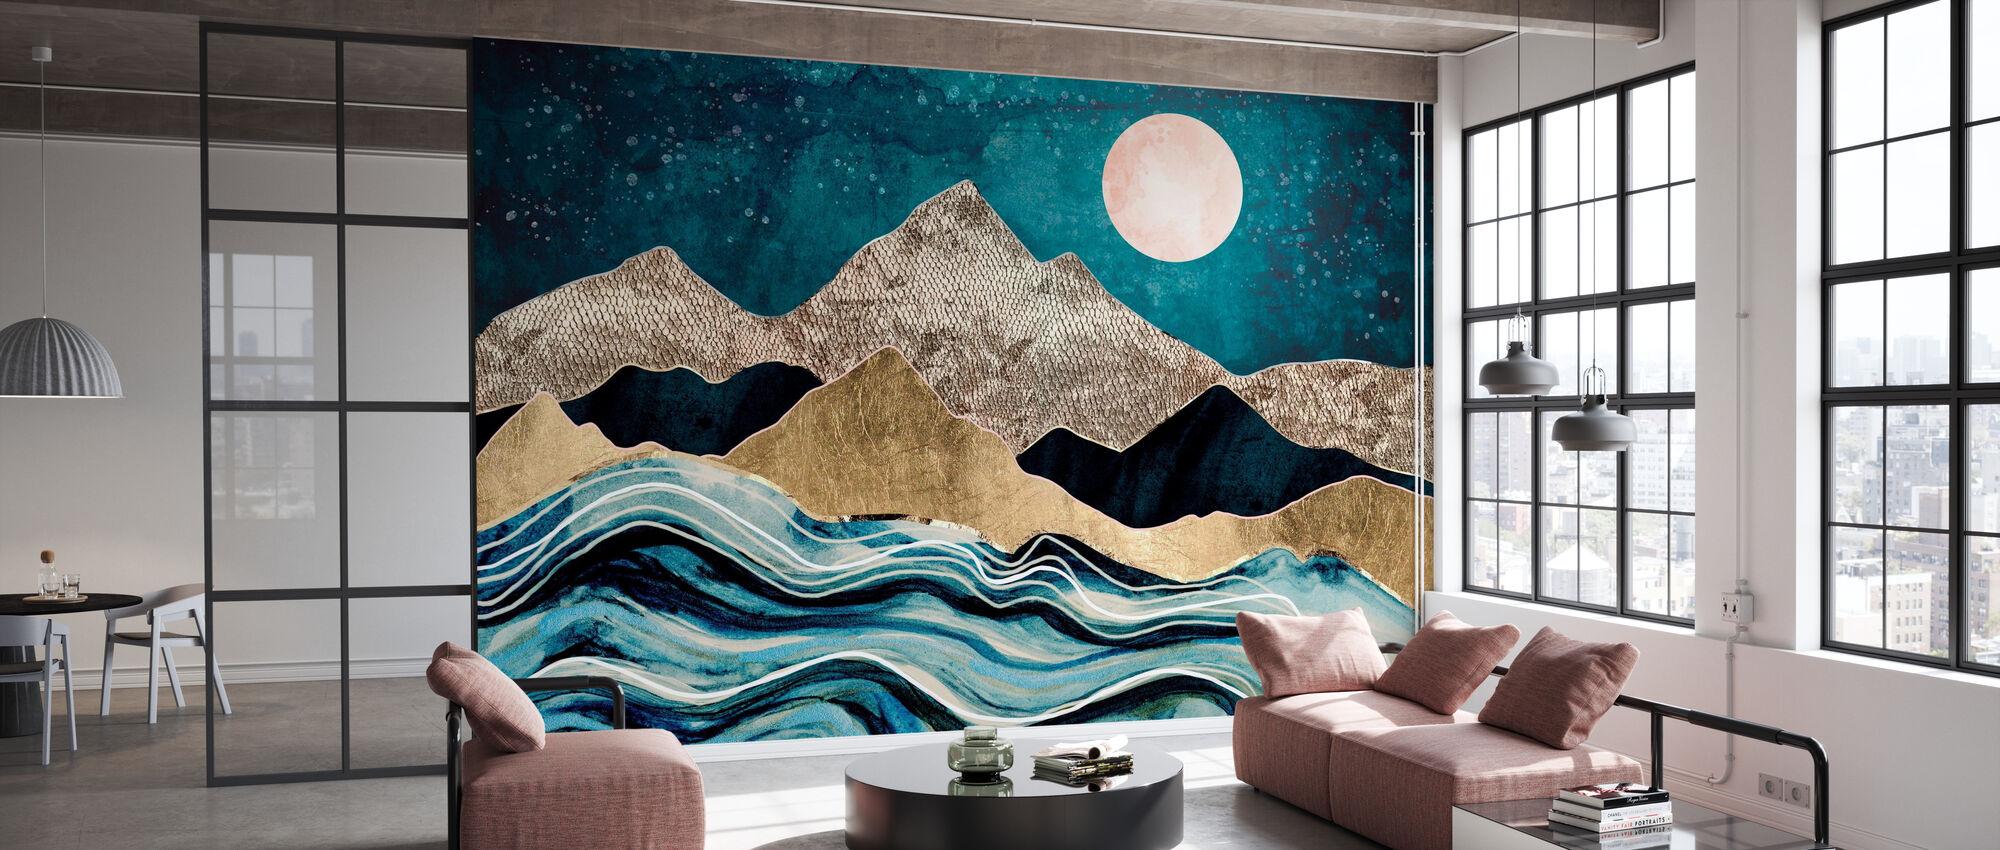 Indigo Sea - Wallpaper - Office